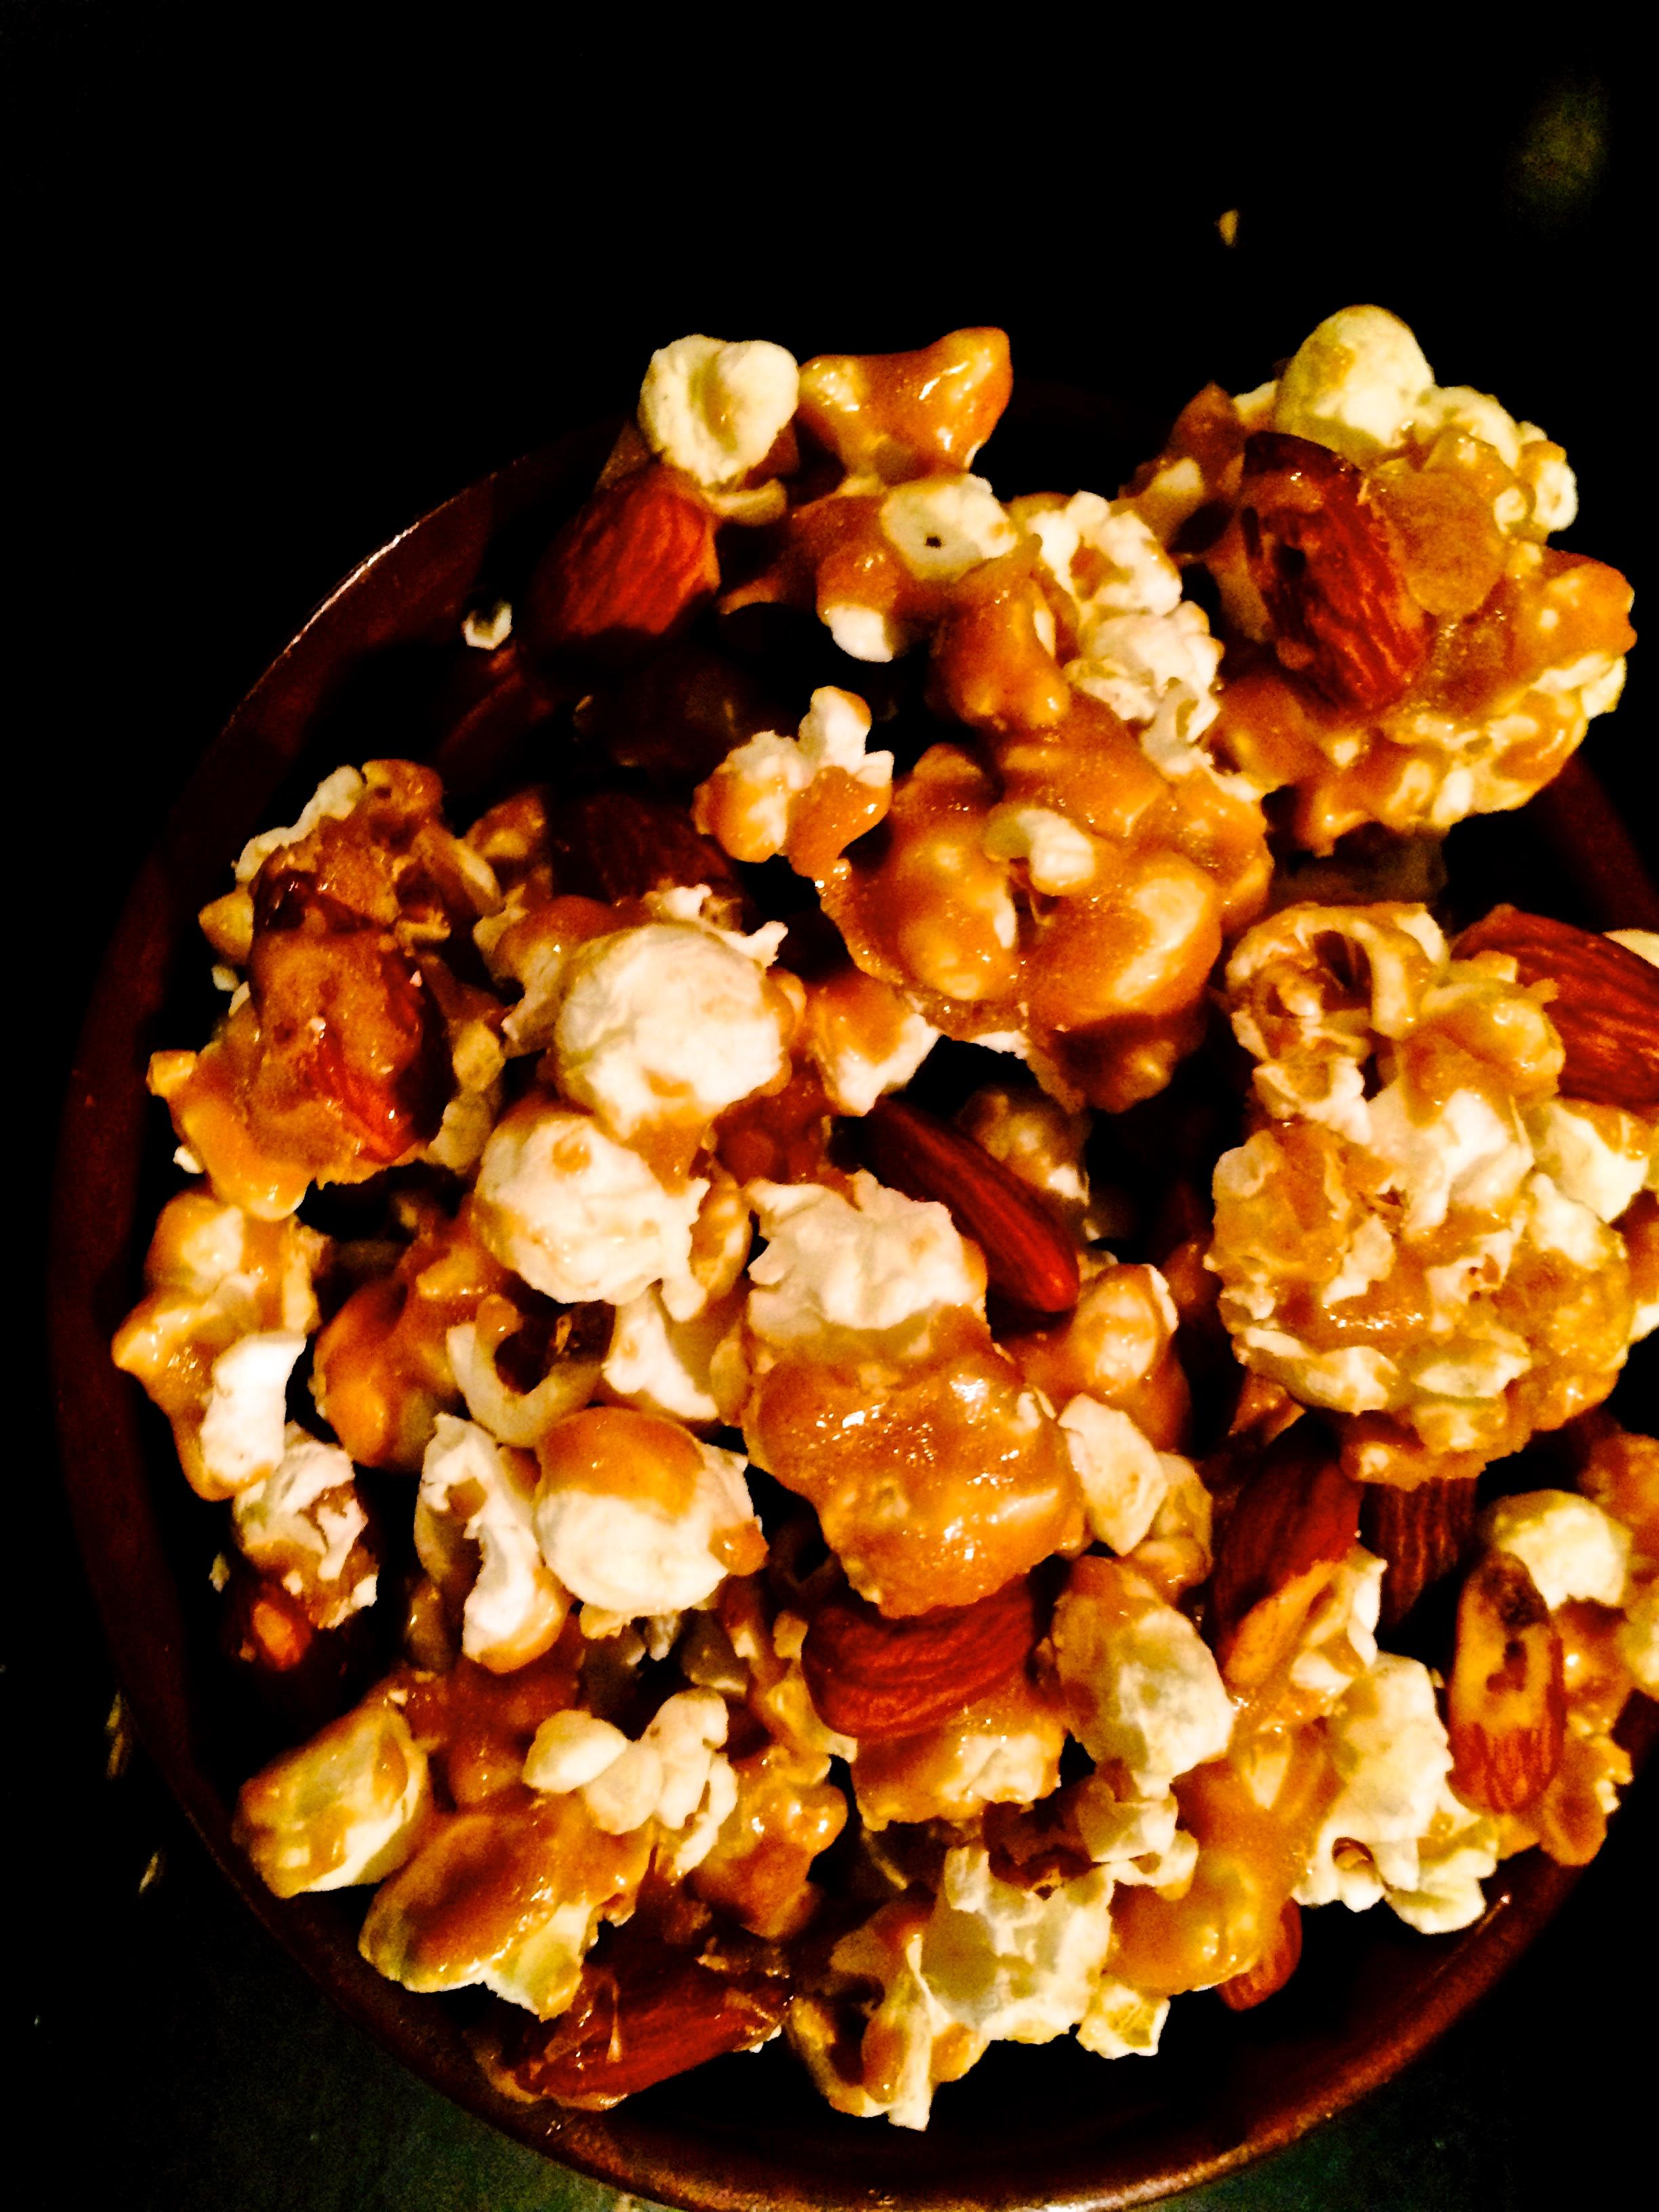 TST_Popcorn_Caramel/Almonds_photo.jpeg